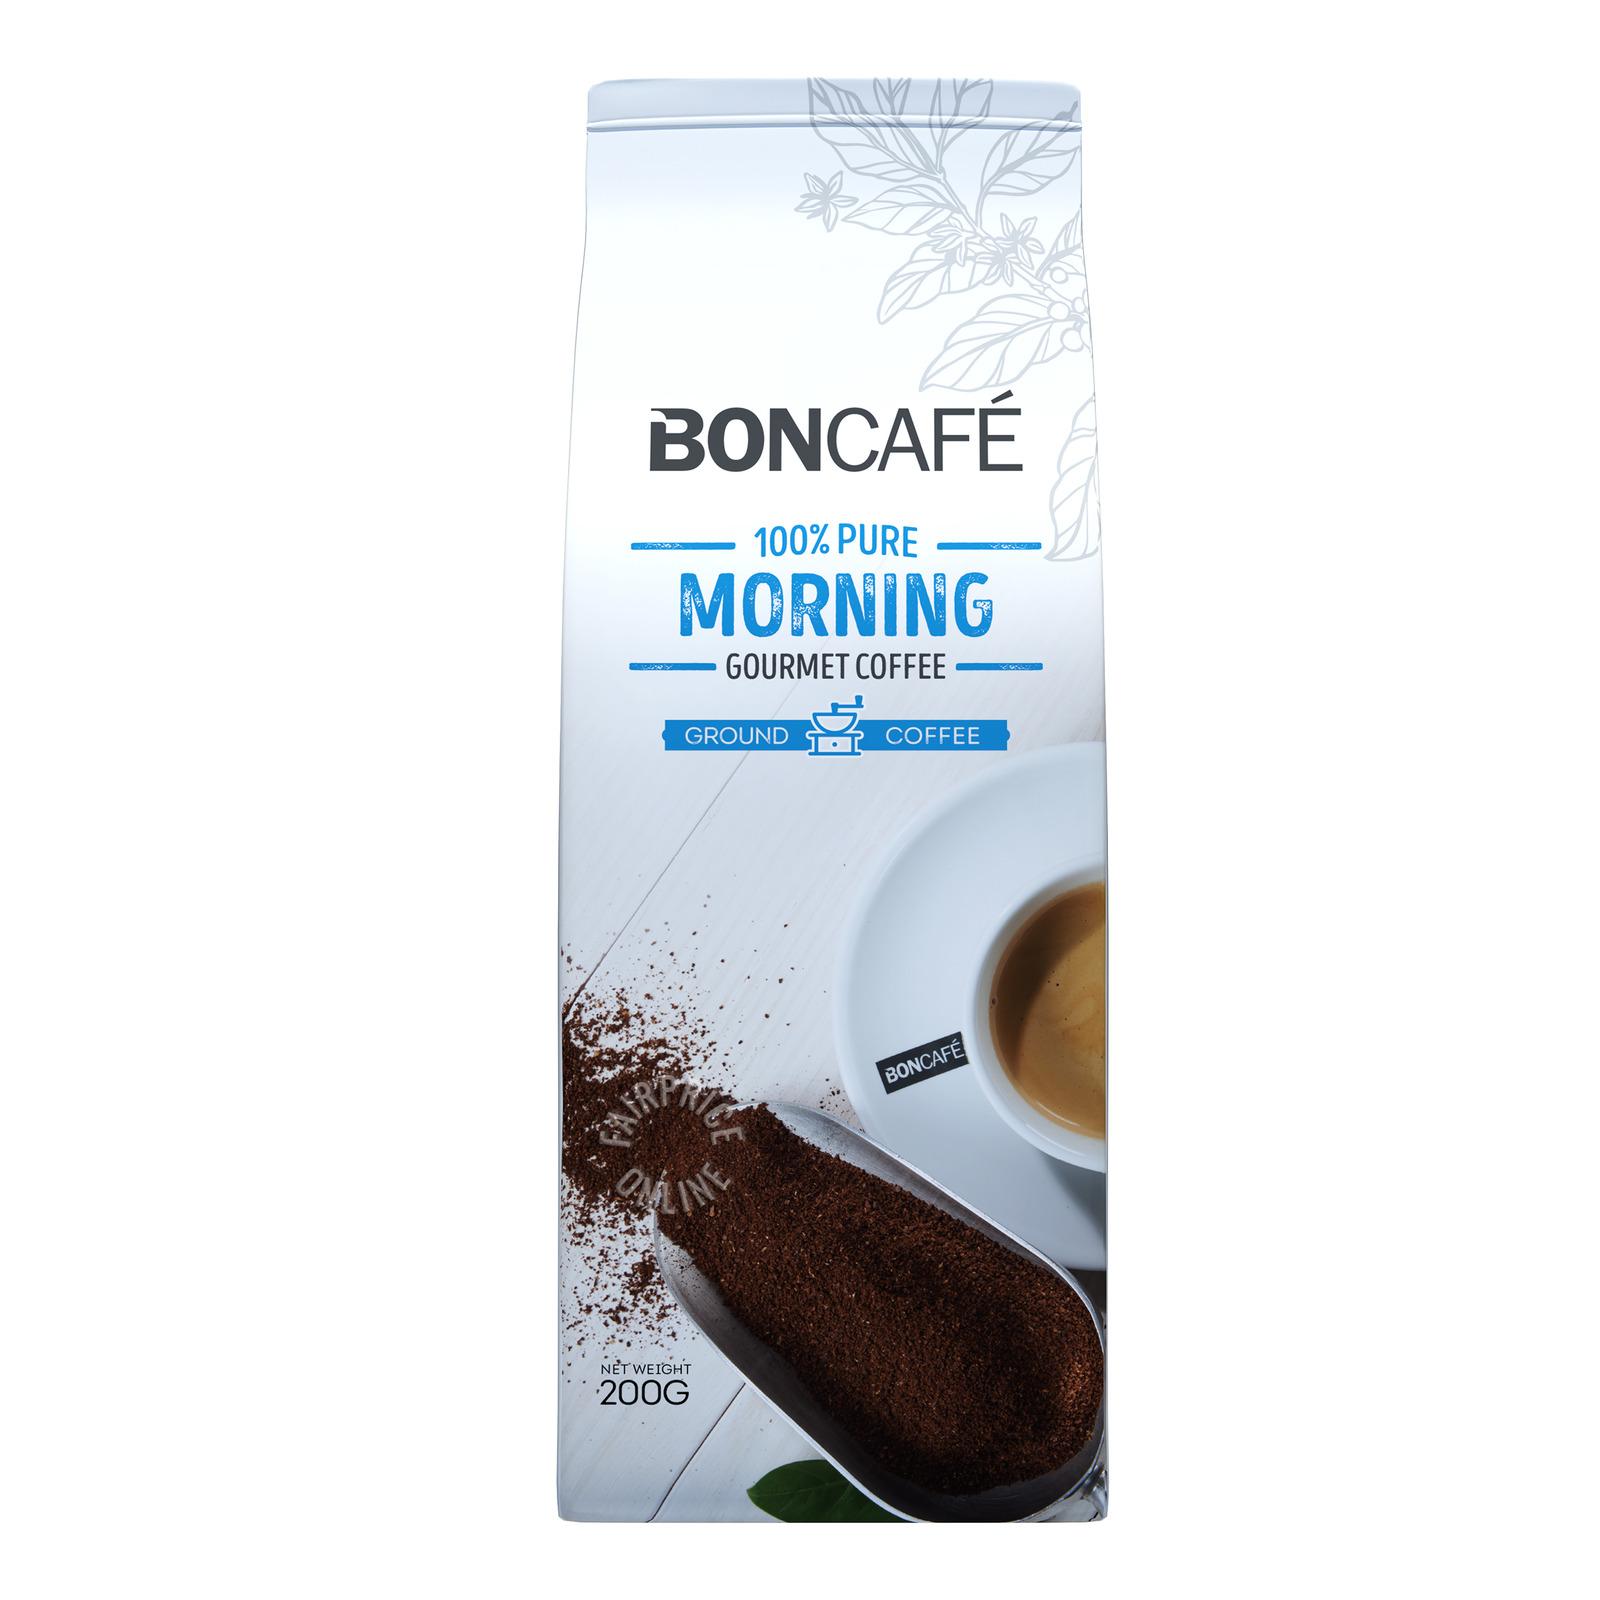 Boncafe Ground Coffee Powder - Morning